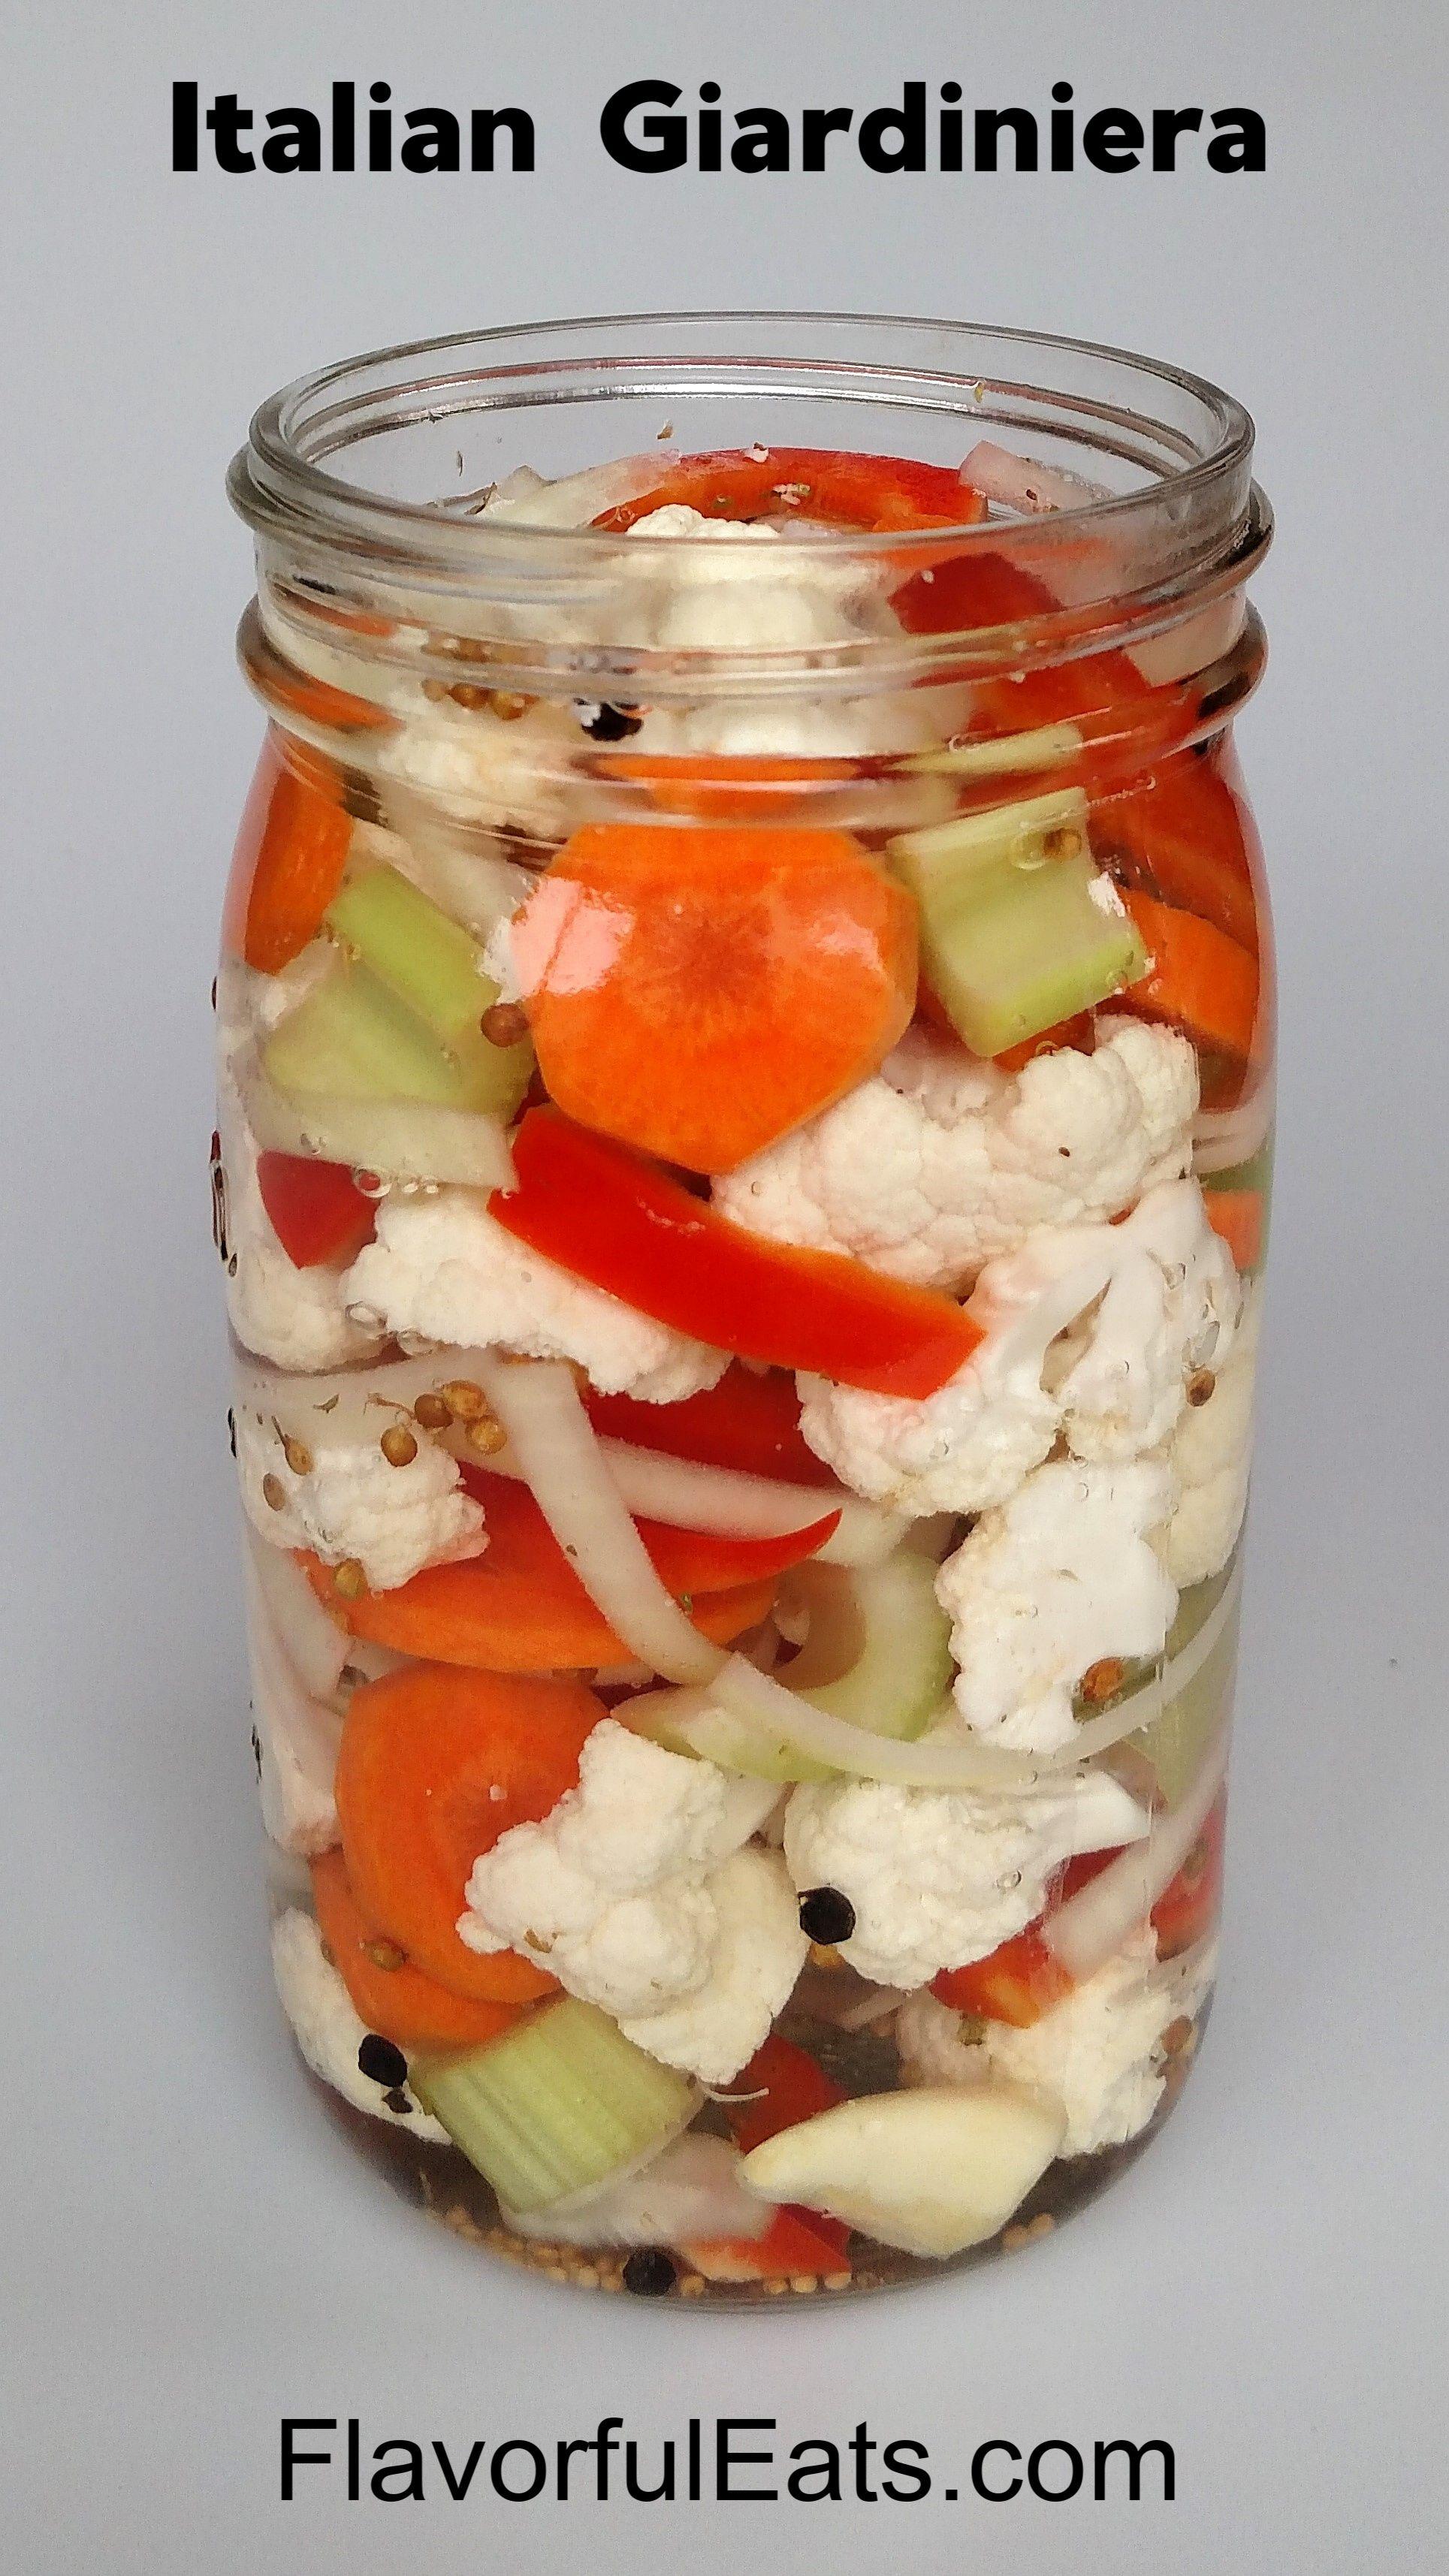 Italian Pickled Vegetables (Giardiniera) Recipe